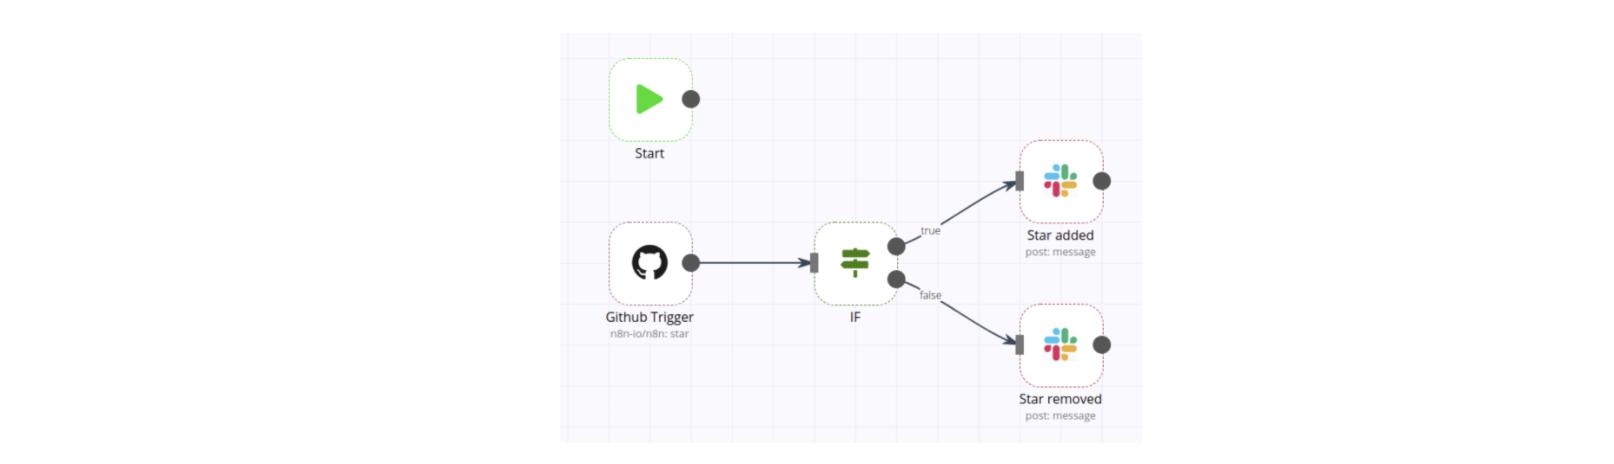 Sample visual workflow